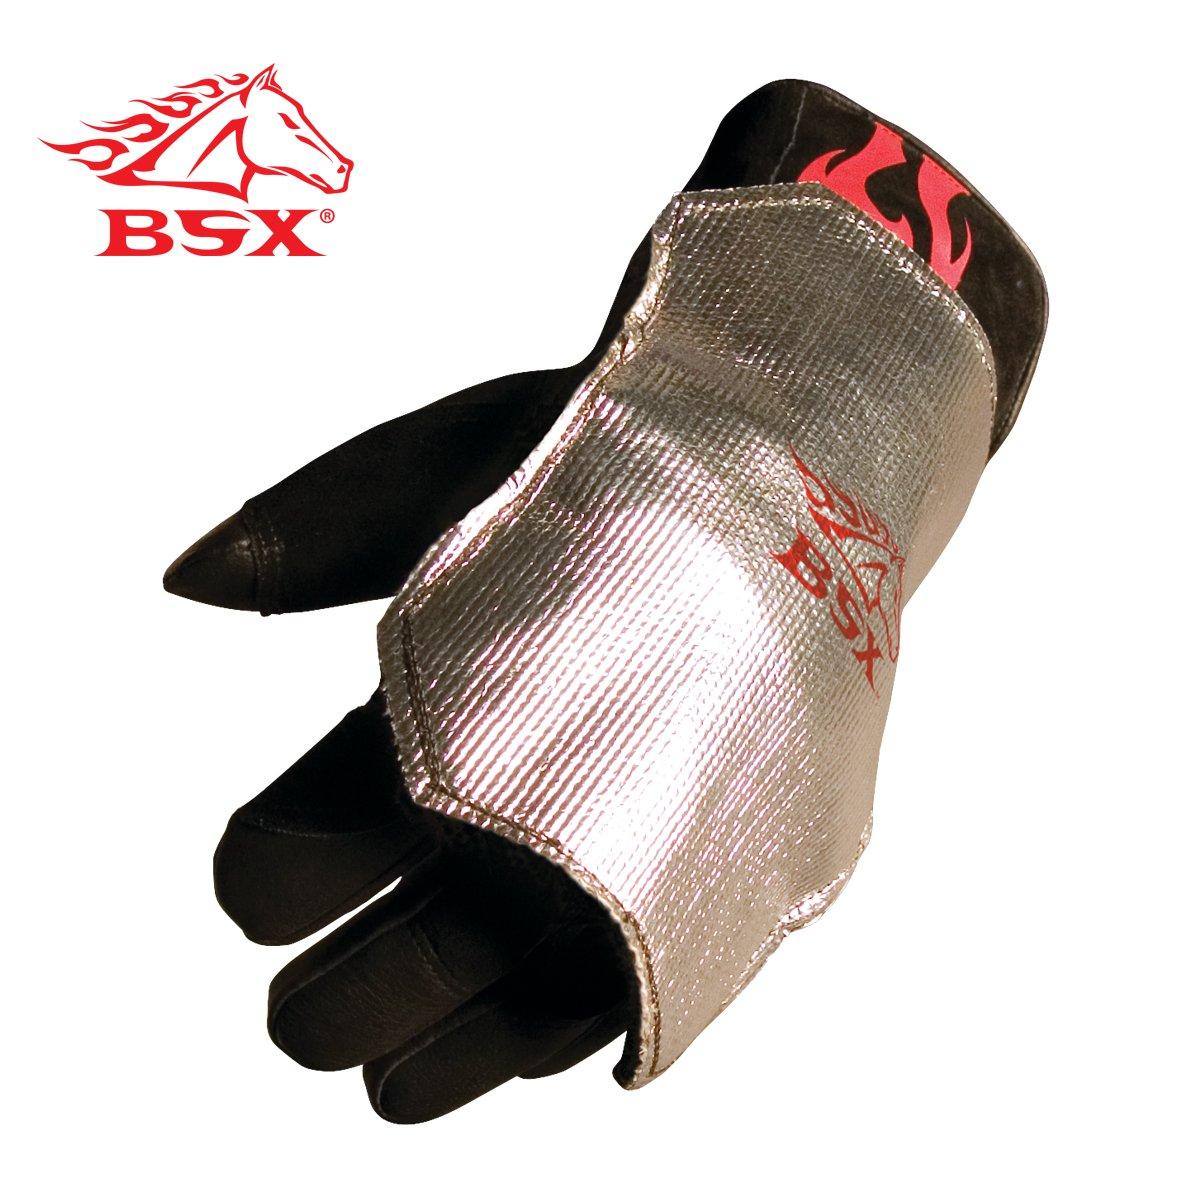 BSX Aluminized Back Pad